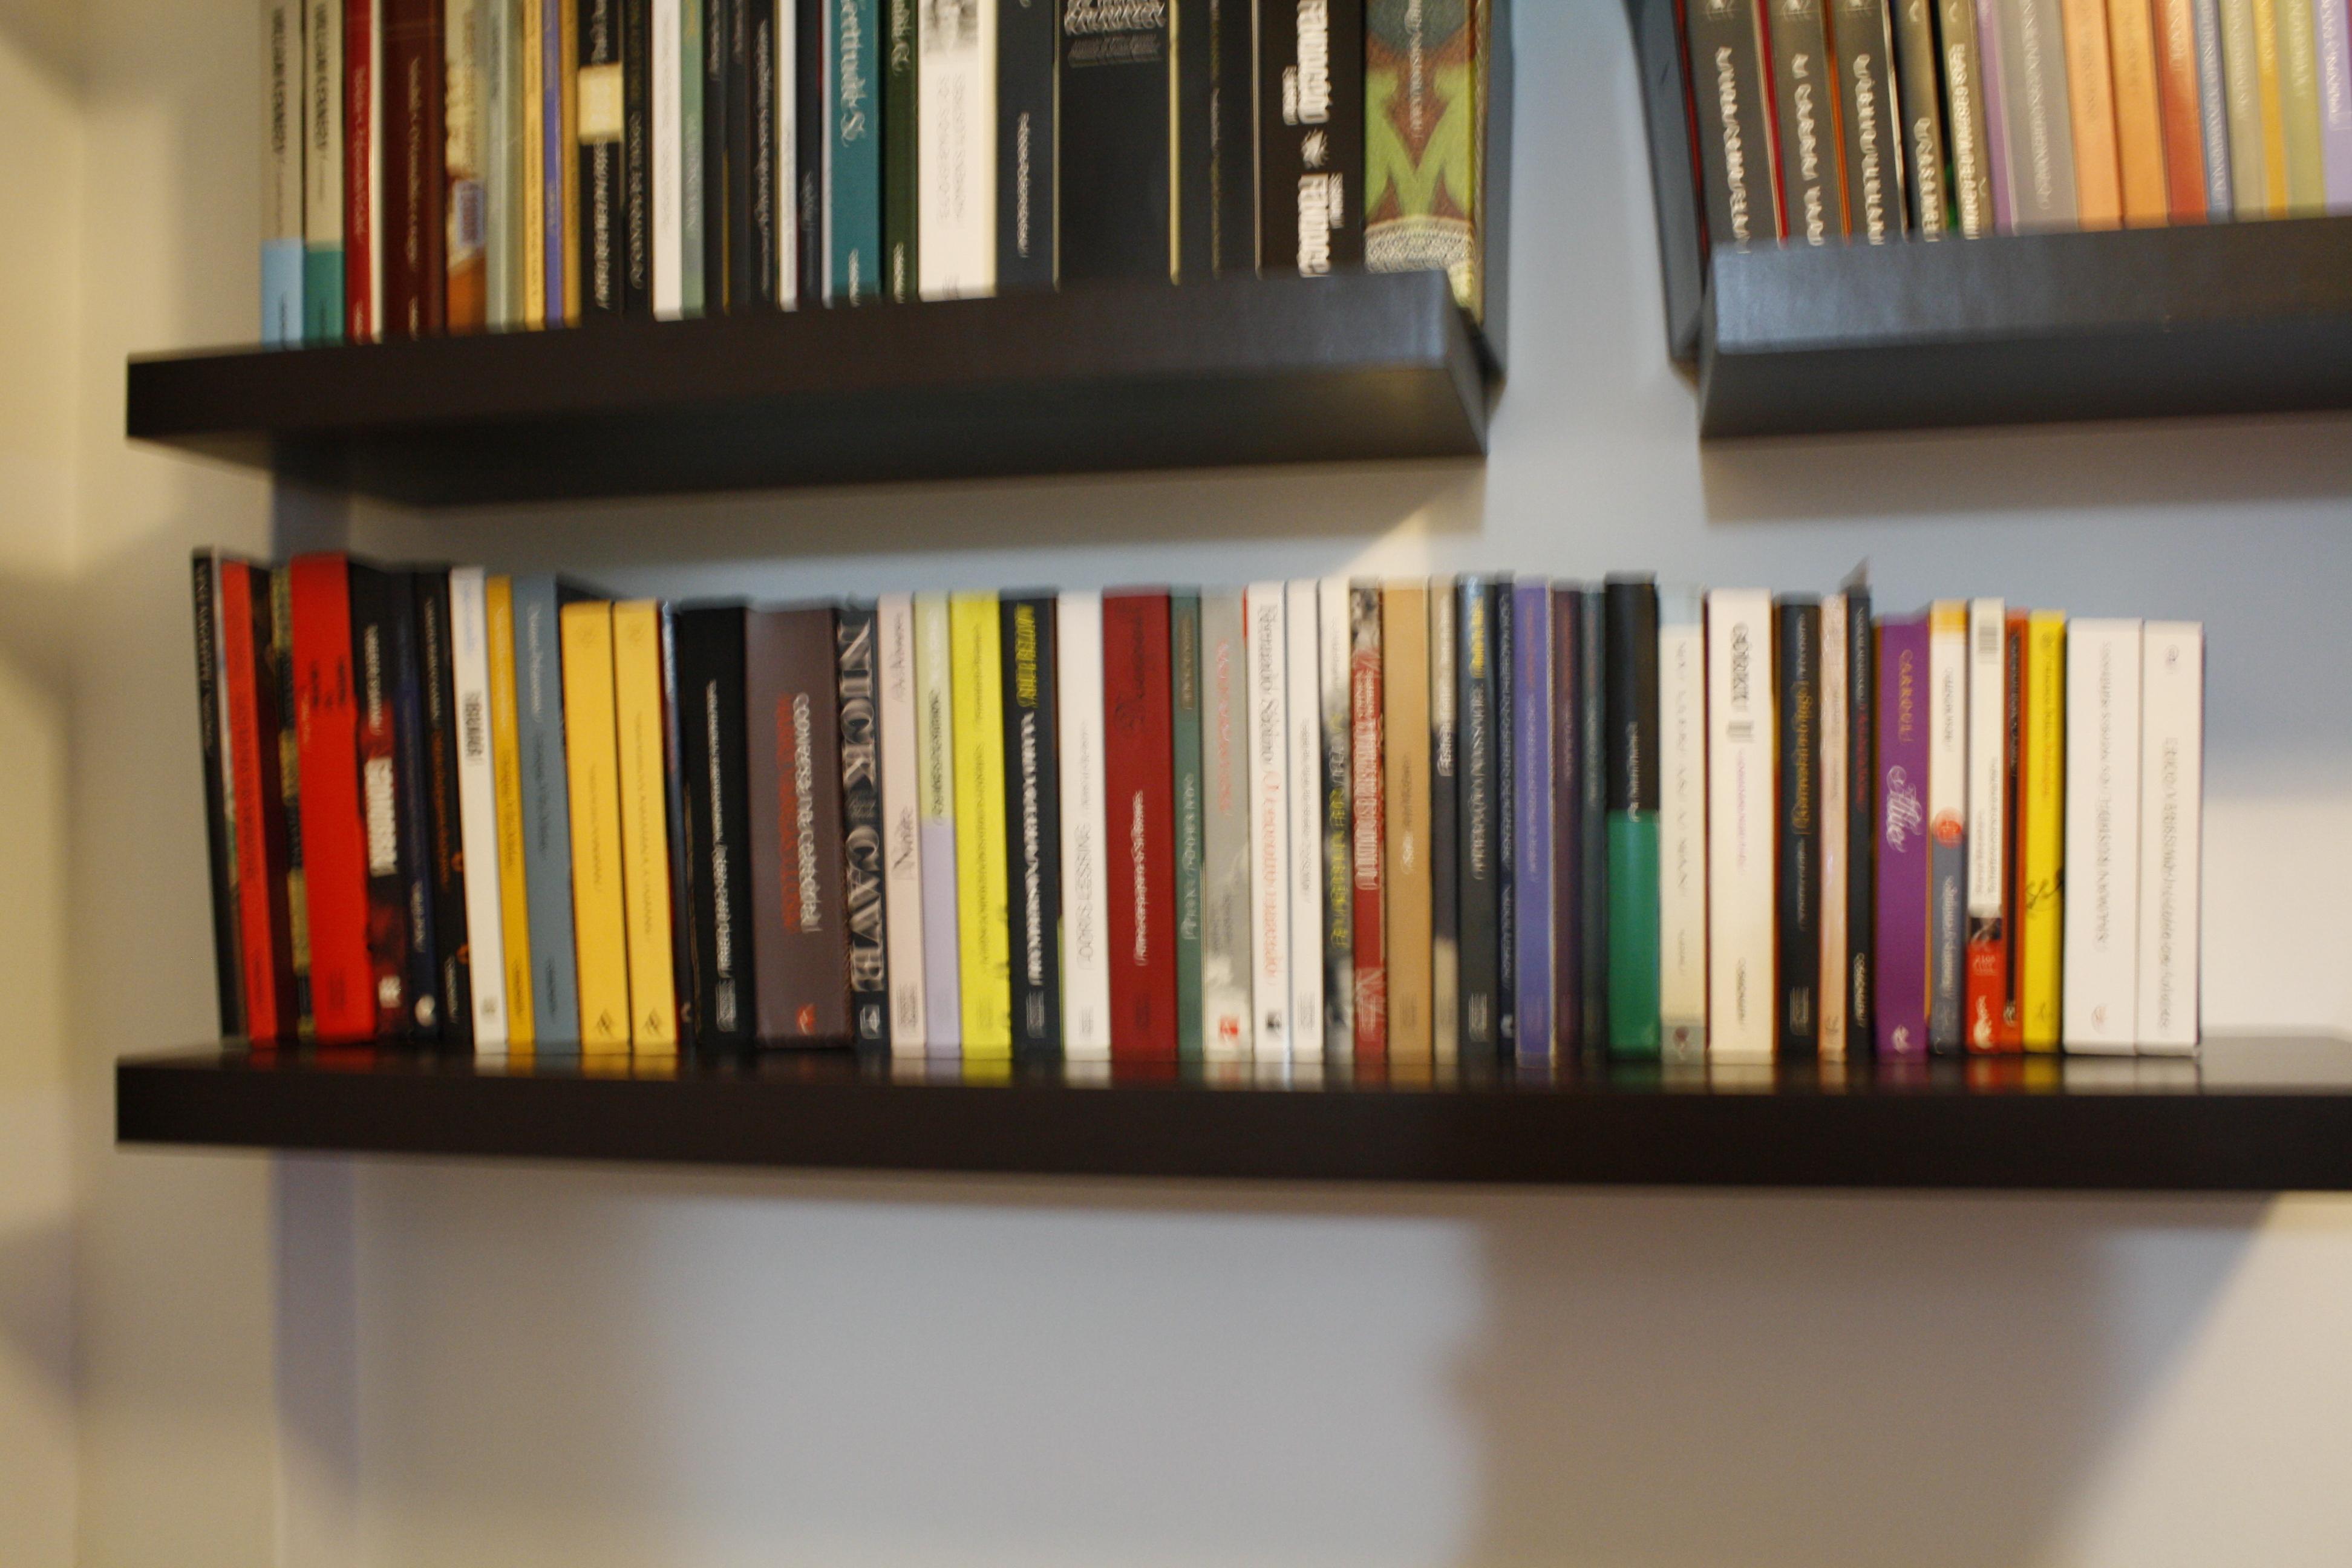 estante superior direita tem bons títulos também: Stanislaw Ponte  #B51C06 3888x2592